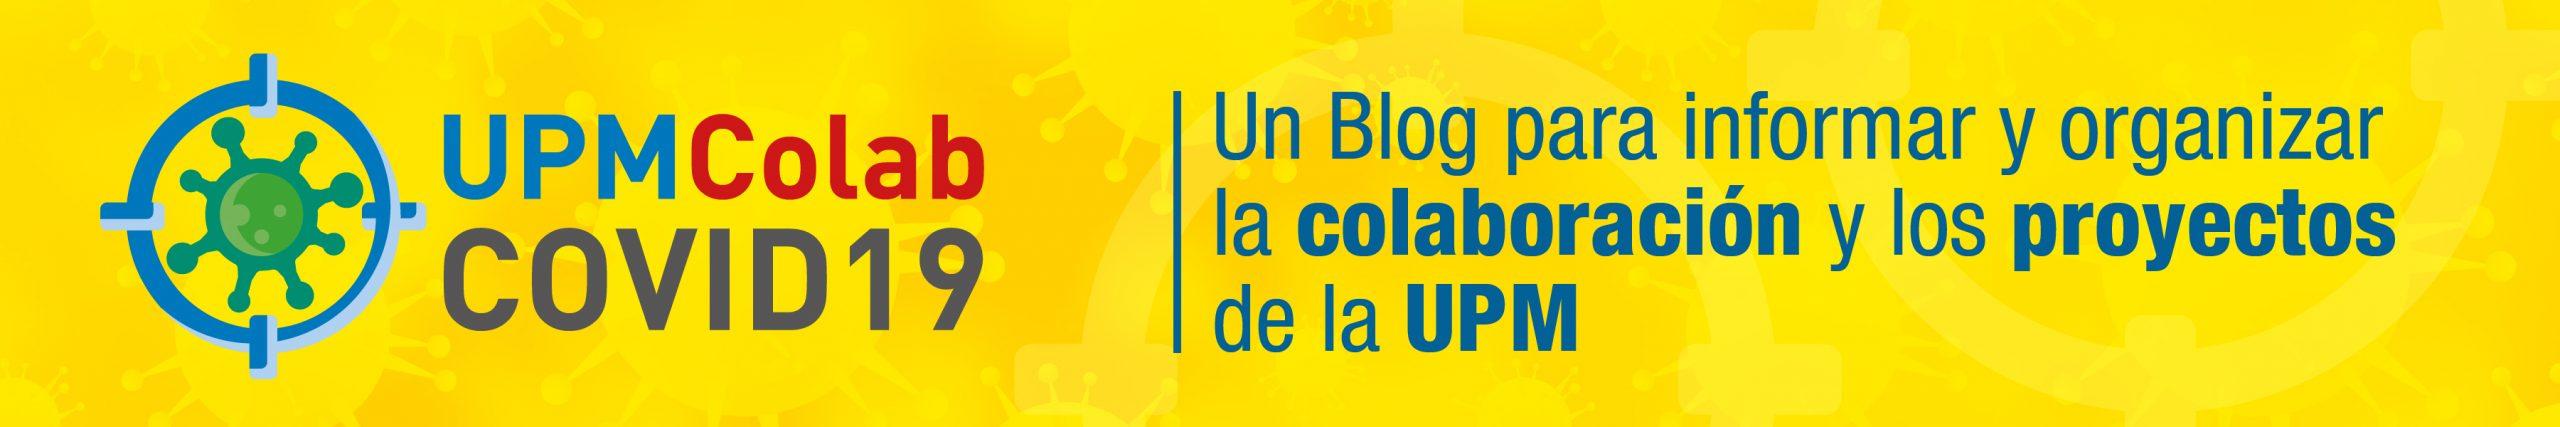 Logo Blog COVID19 - UPM